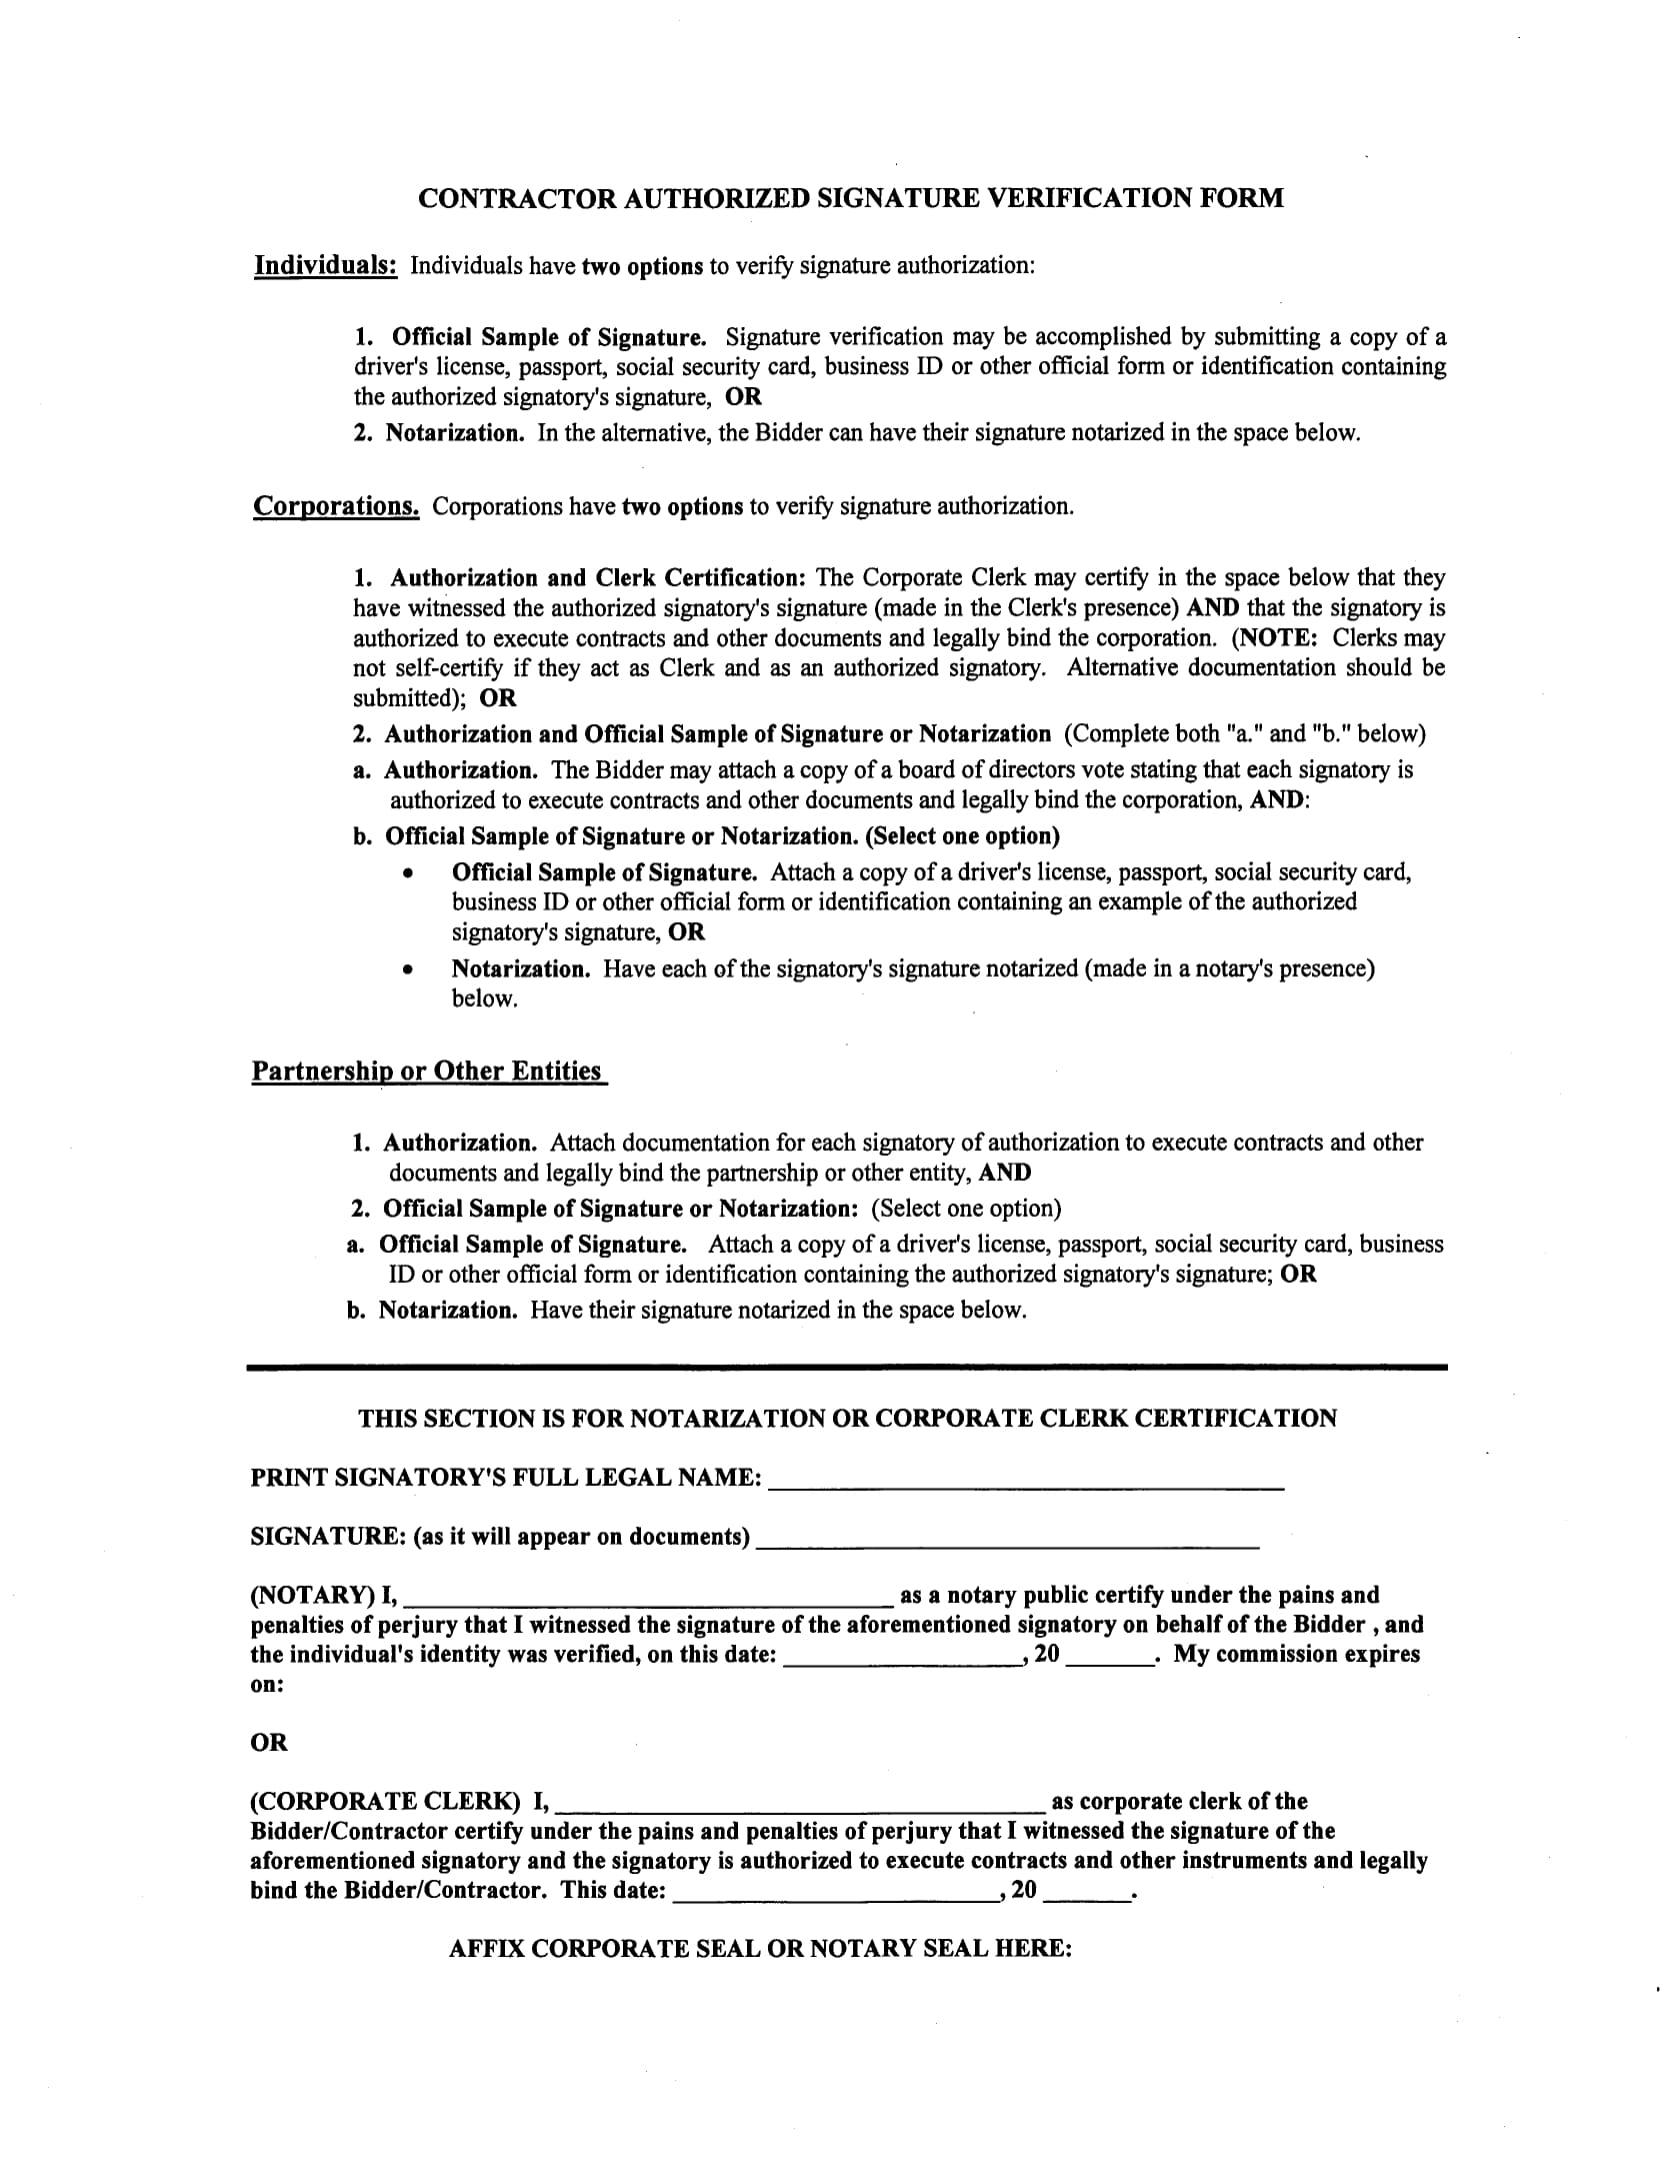 What Is A Signature Verification Form